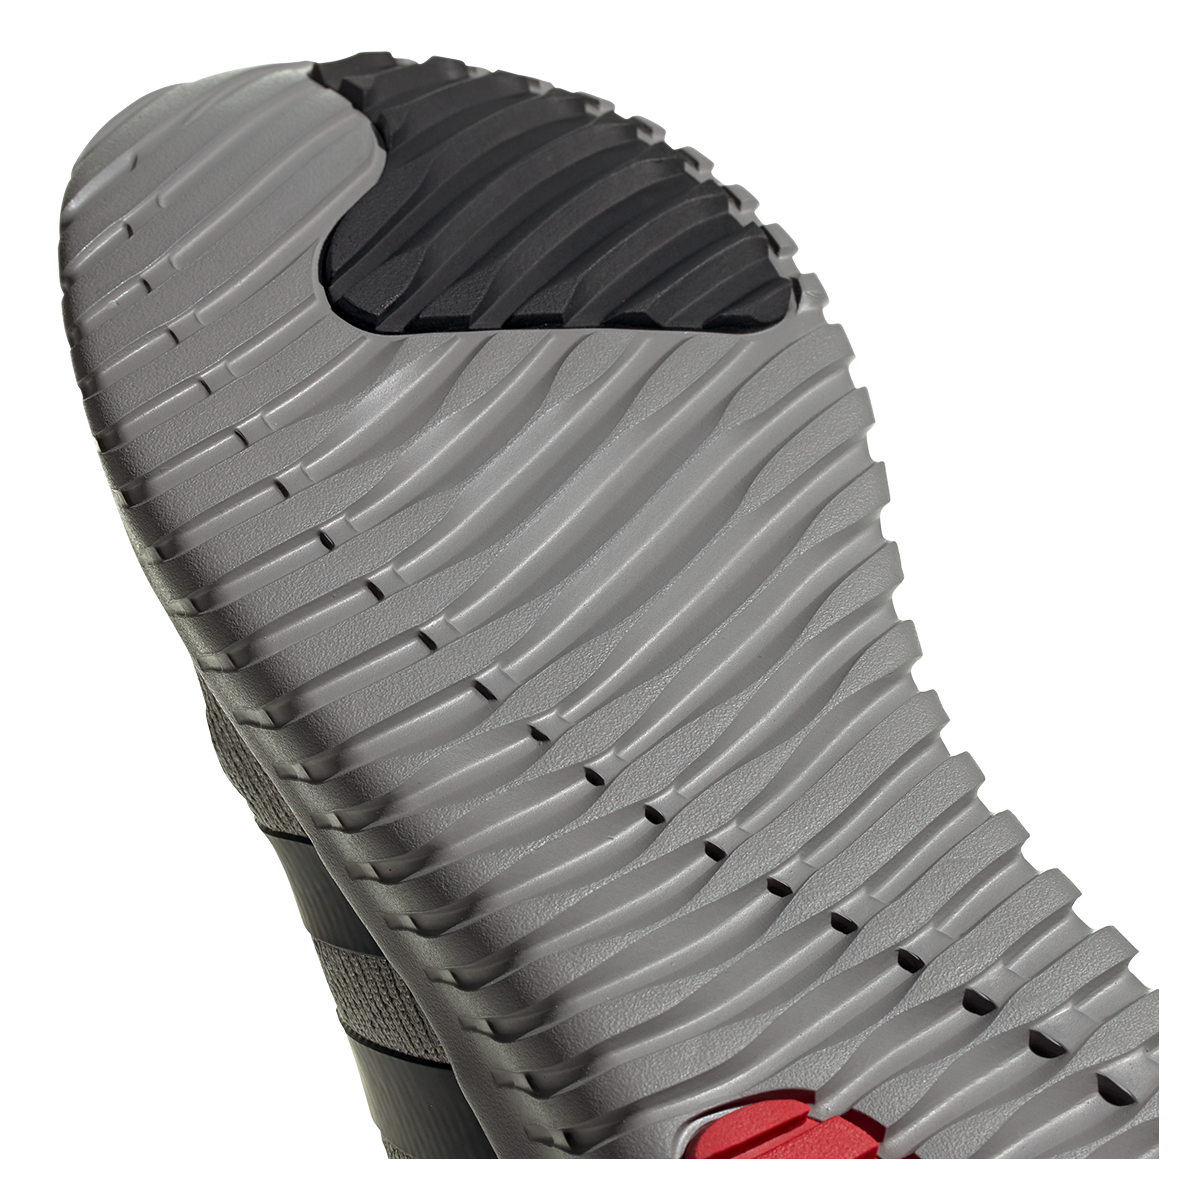 adidas Schuh Kaptir grauschwarz Fussball Shop